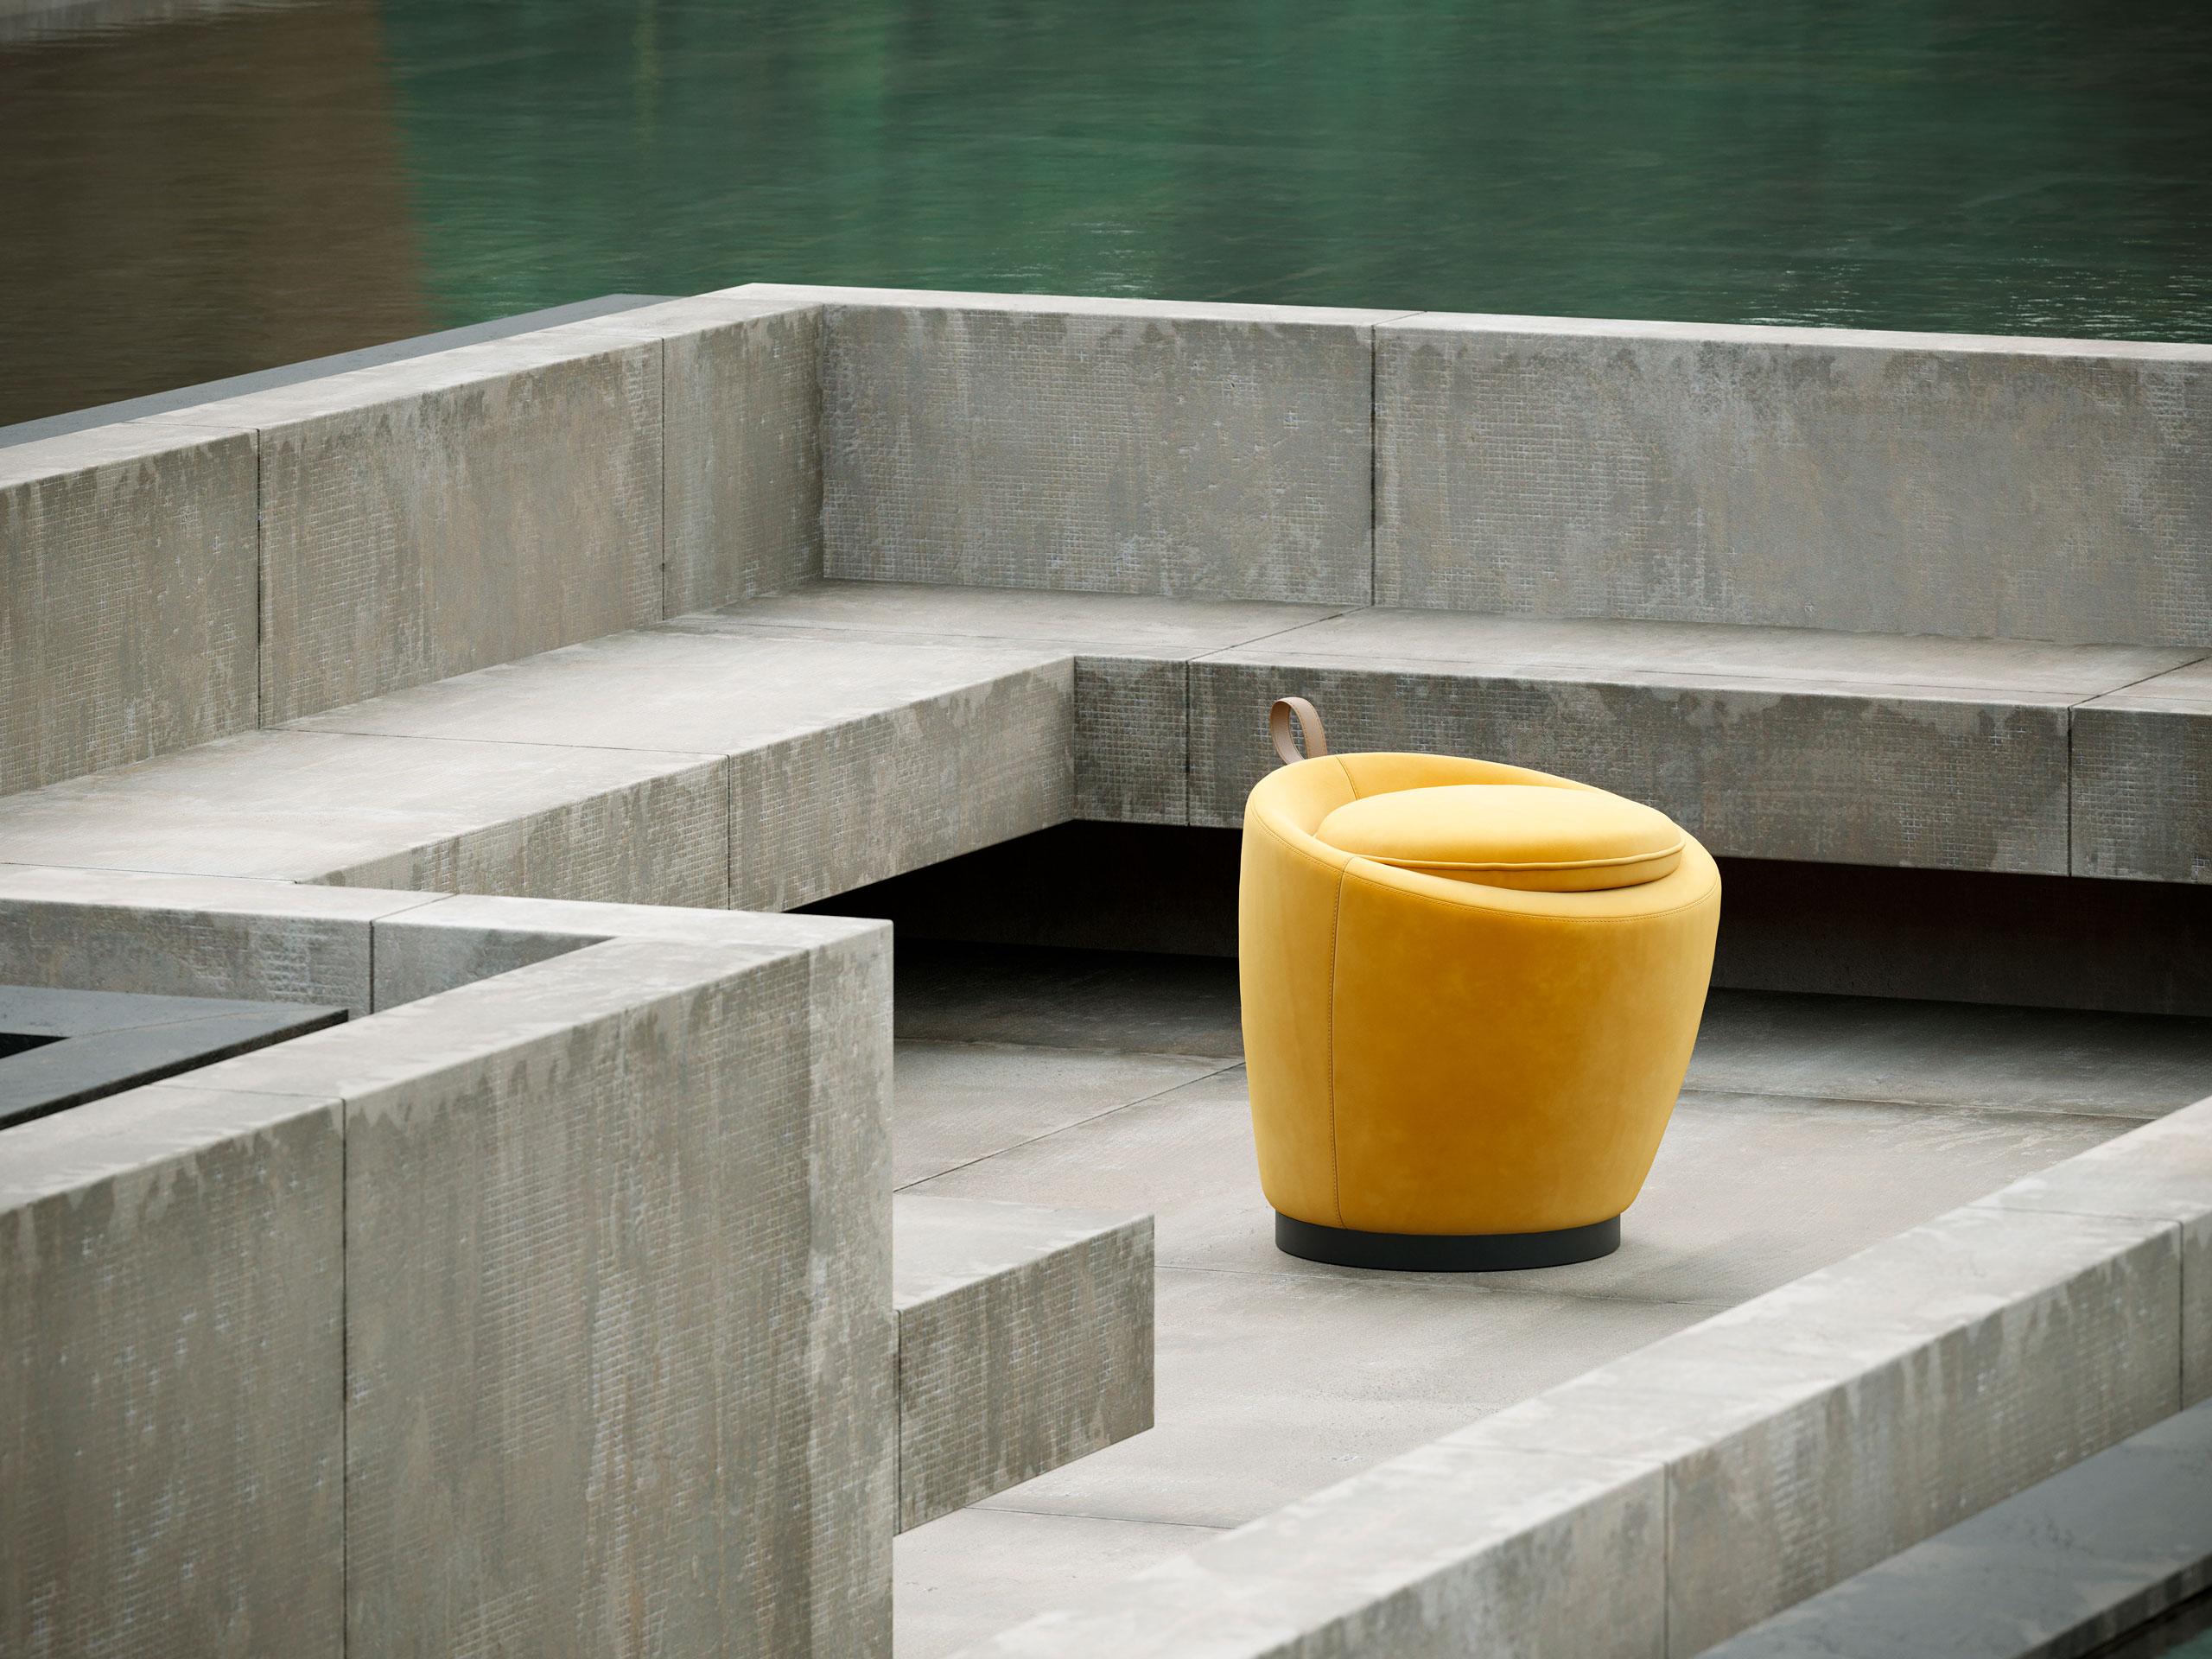 liz-pouf-domkapa-new-collection-2021-home-decor-1